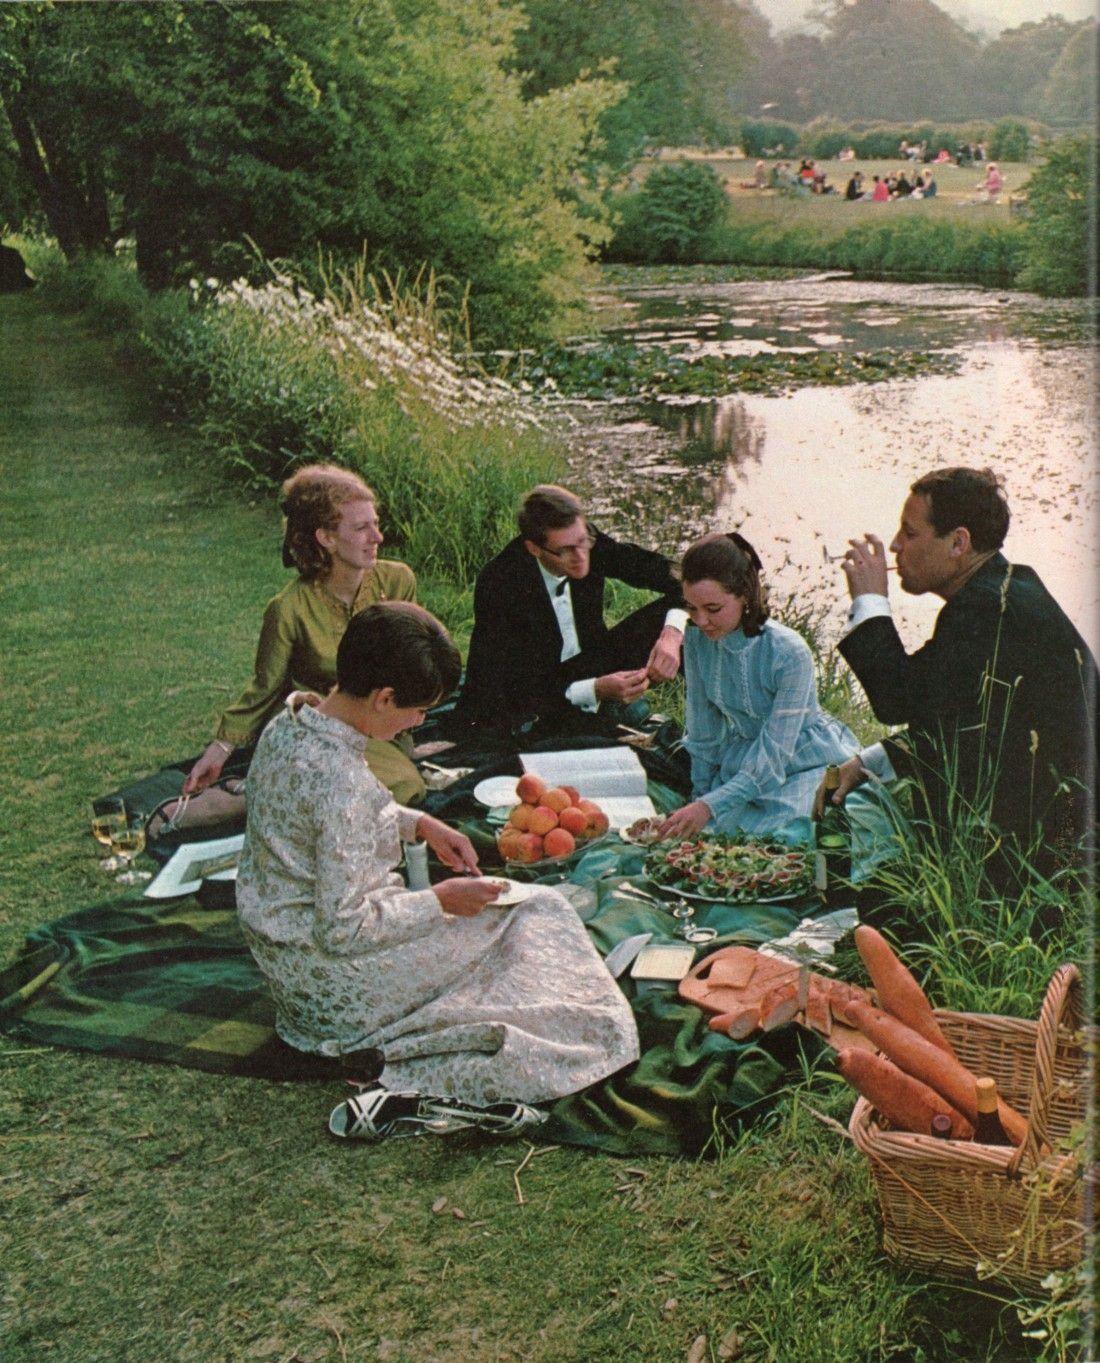 C 1969: The British picnic,a venerable institution whose